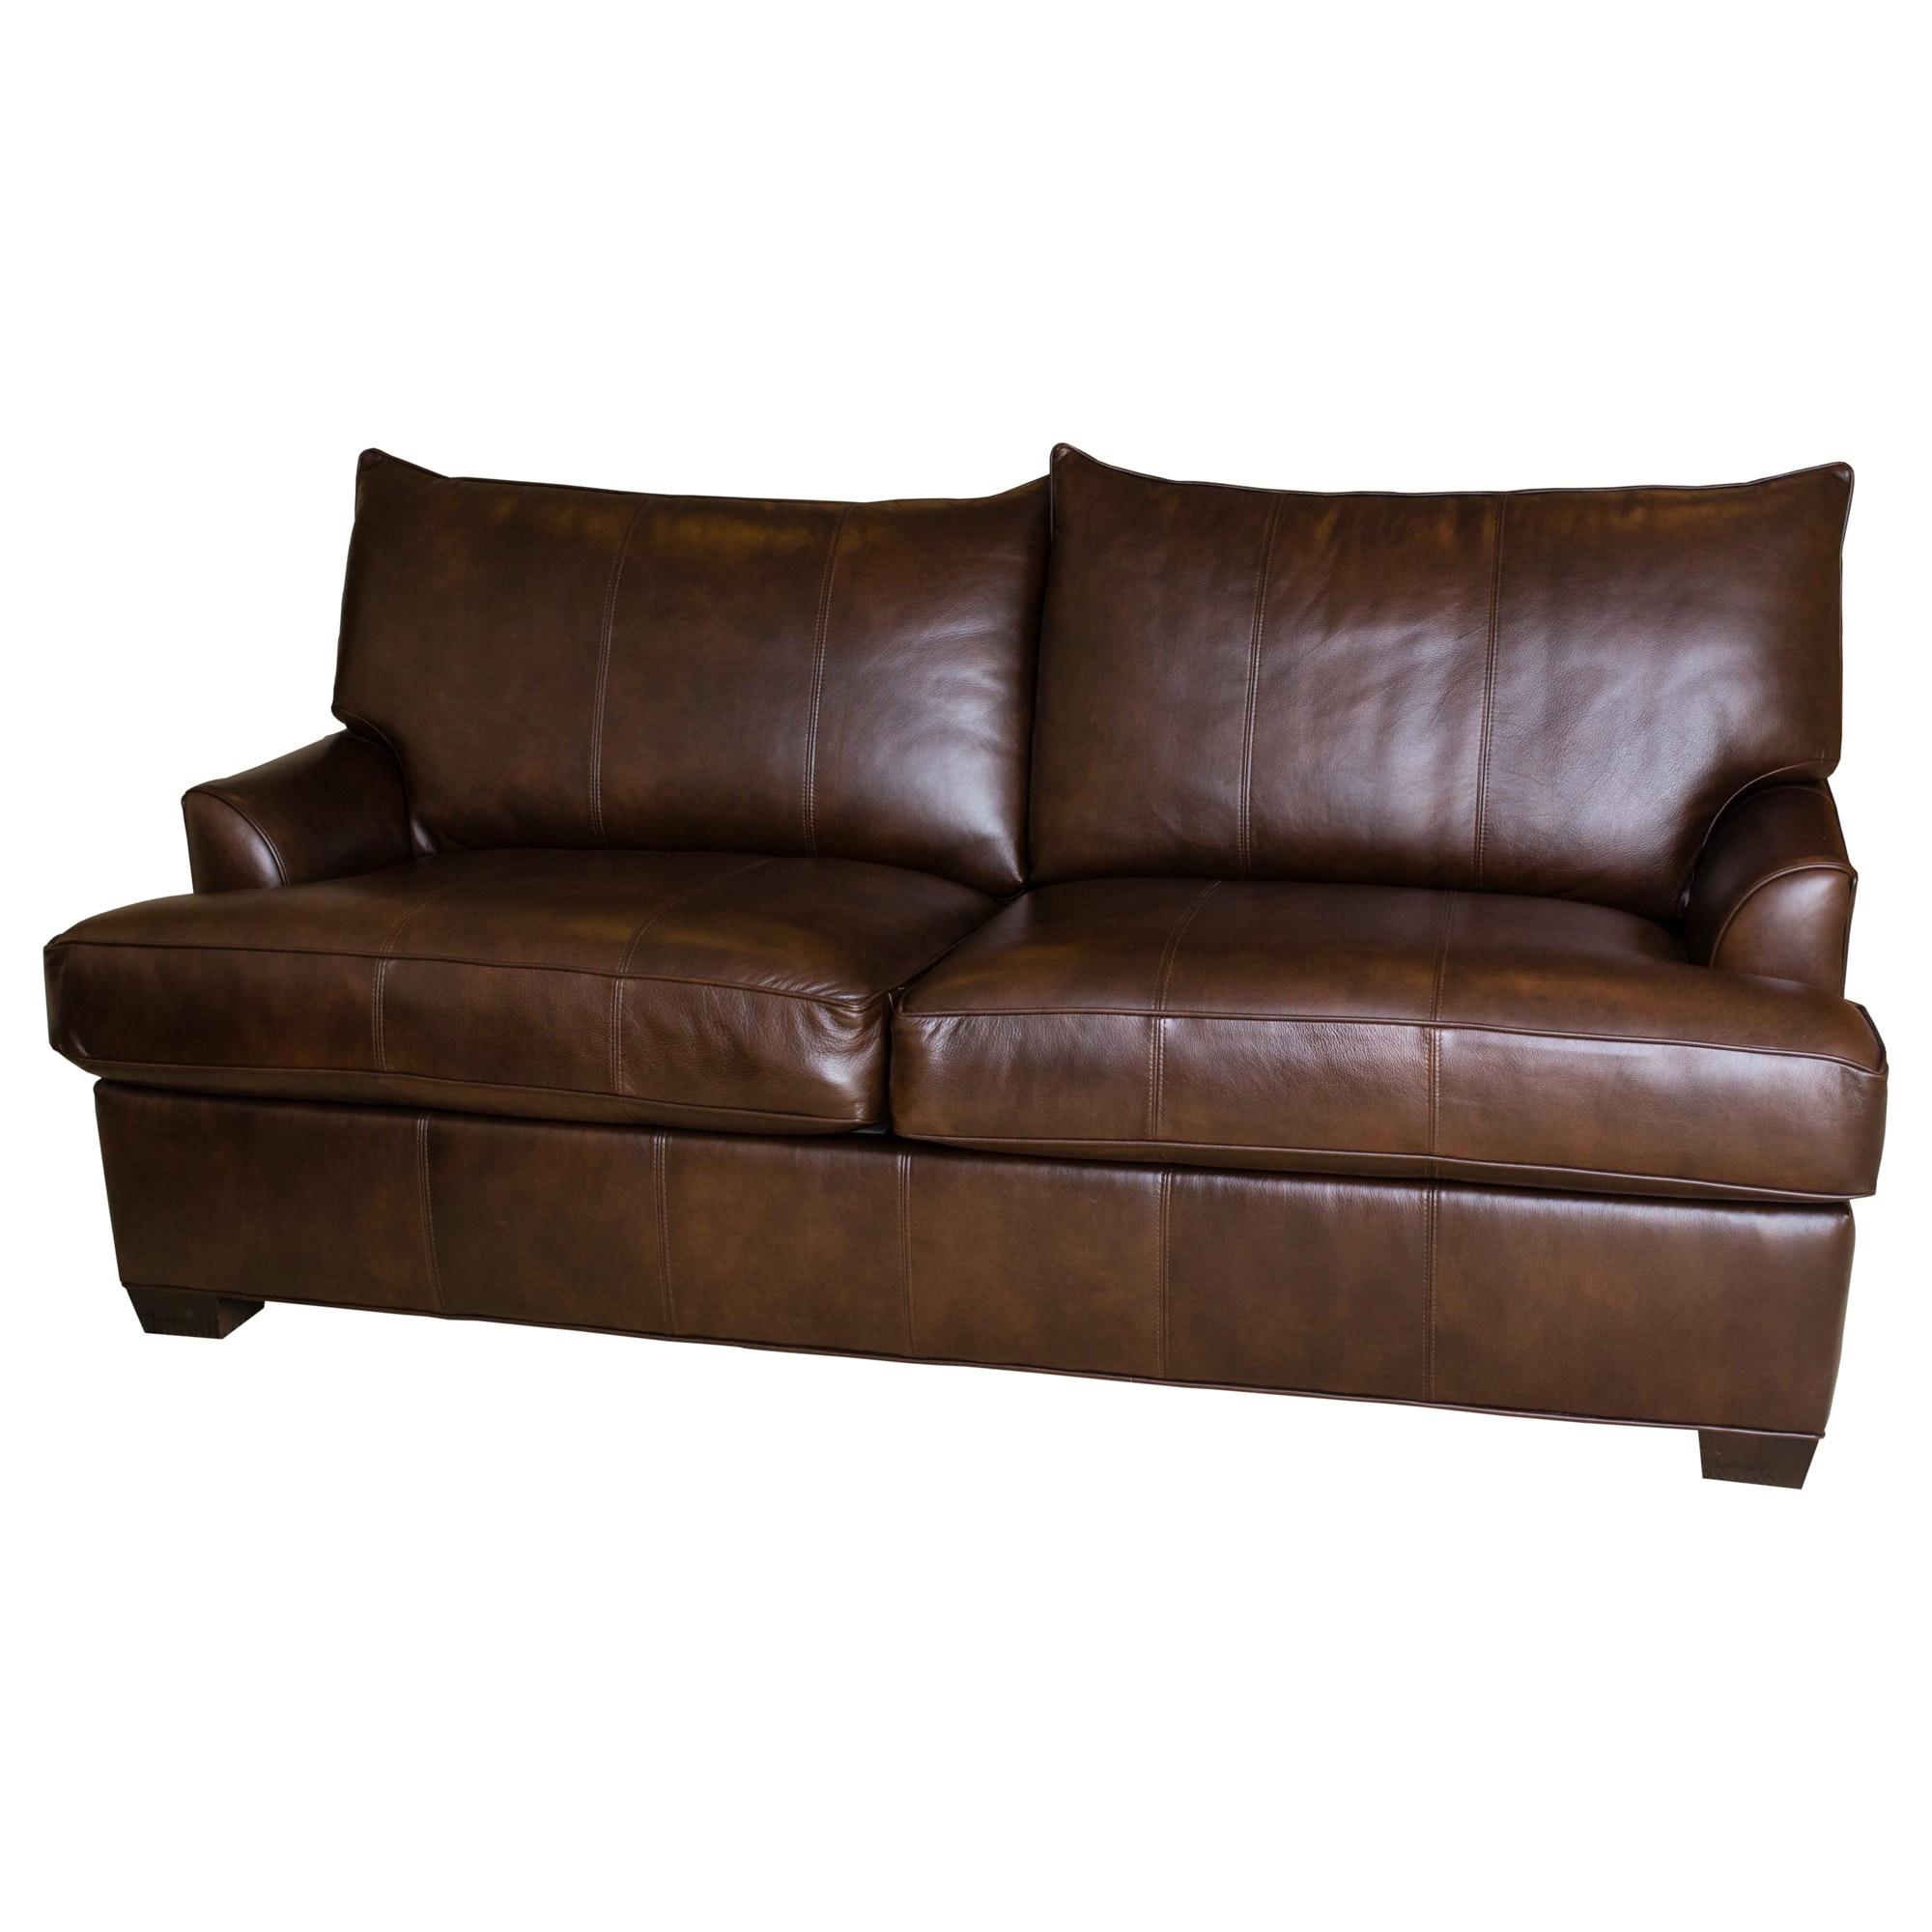 Ethan Allen Leather Sofa